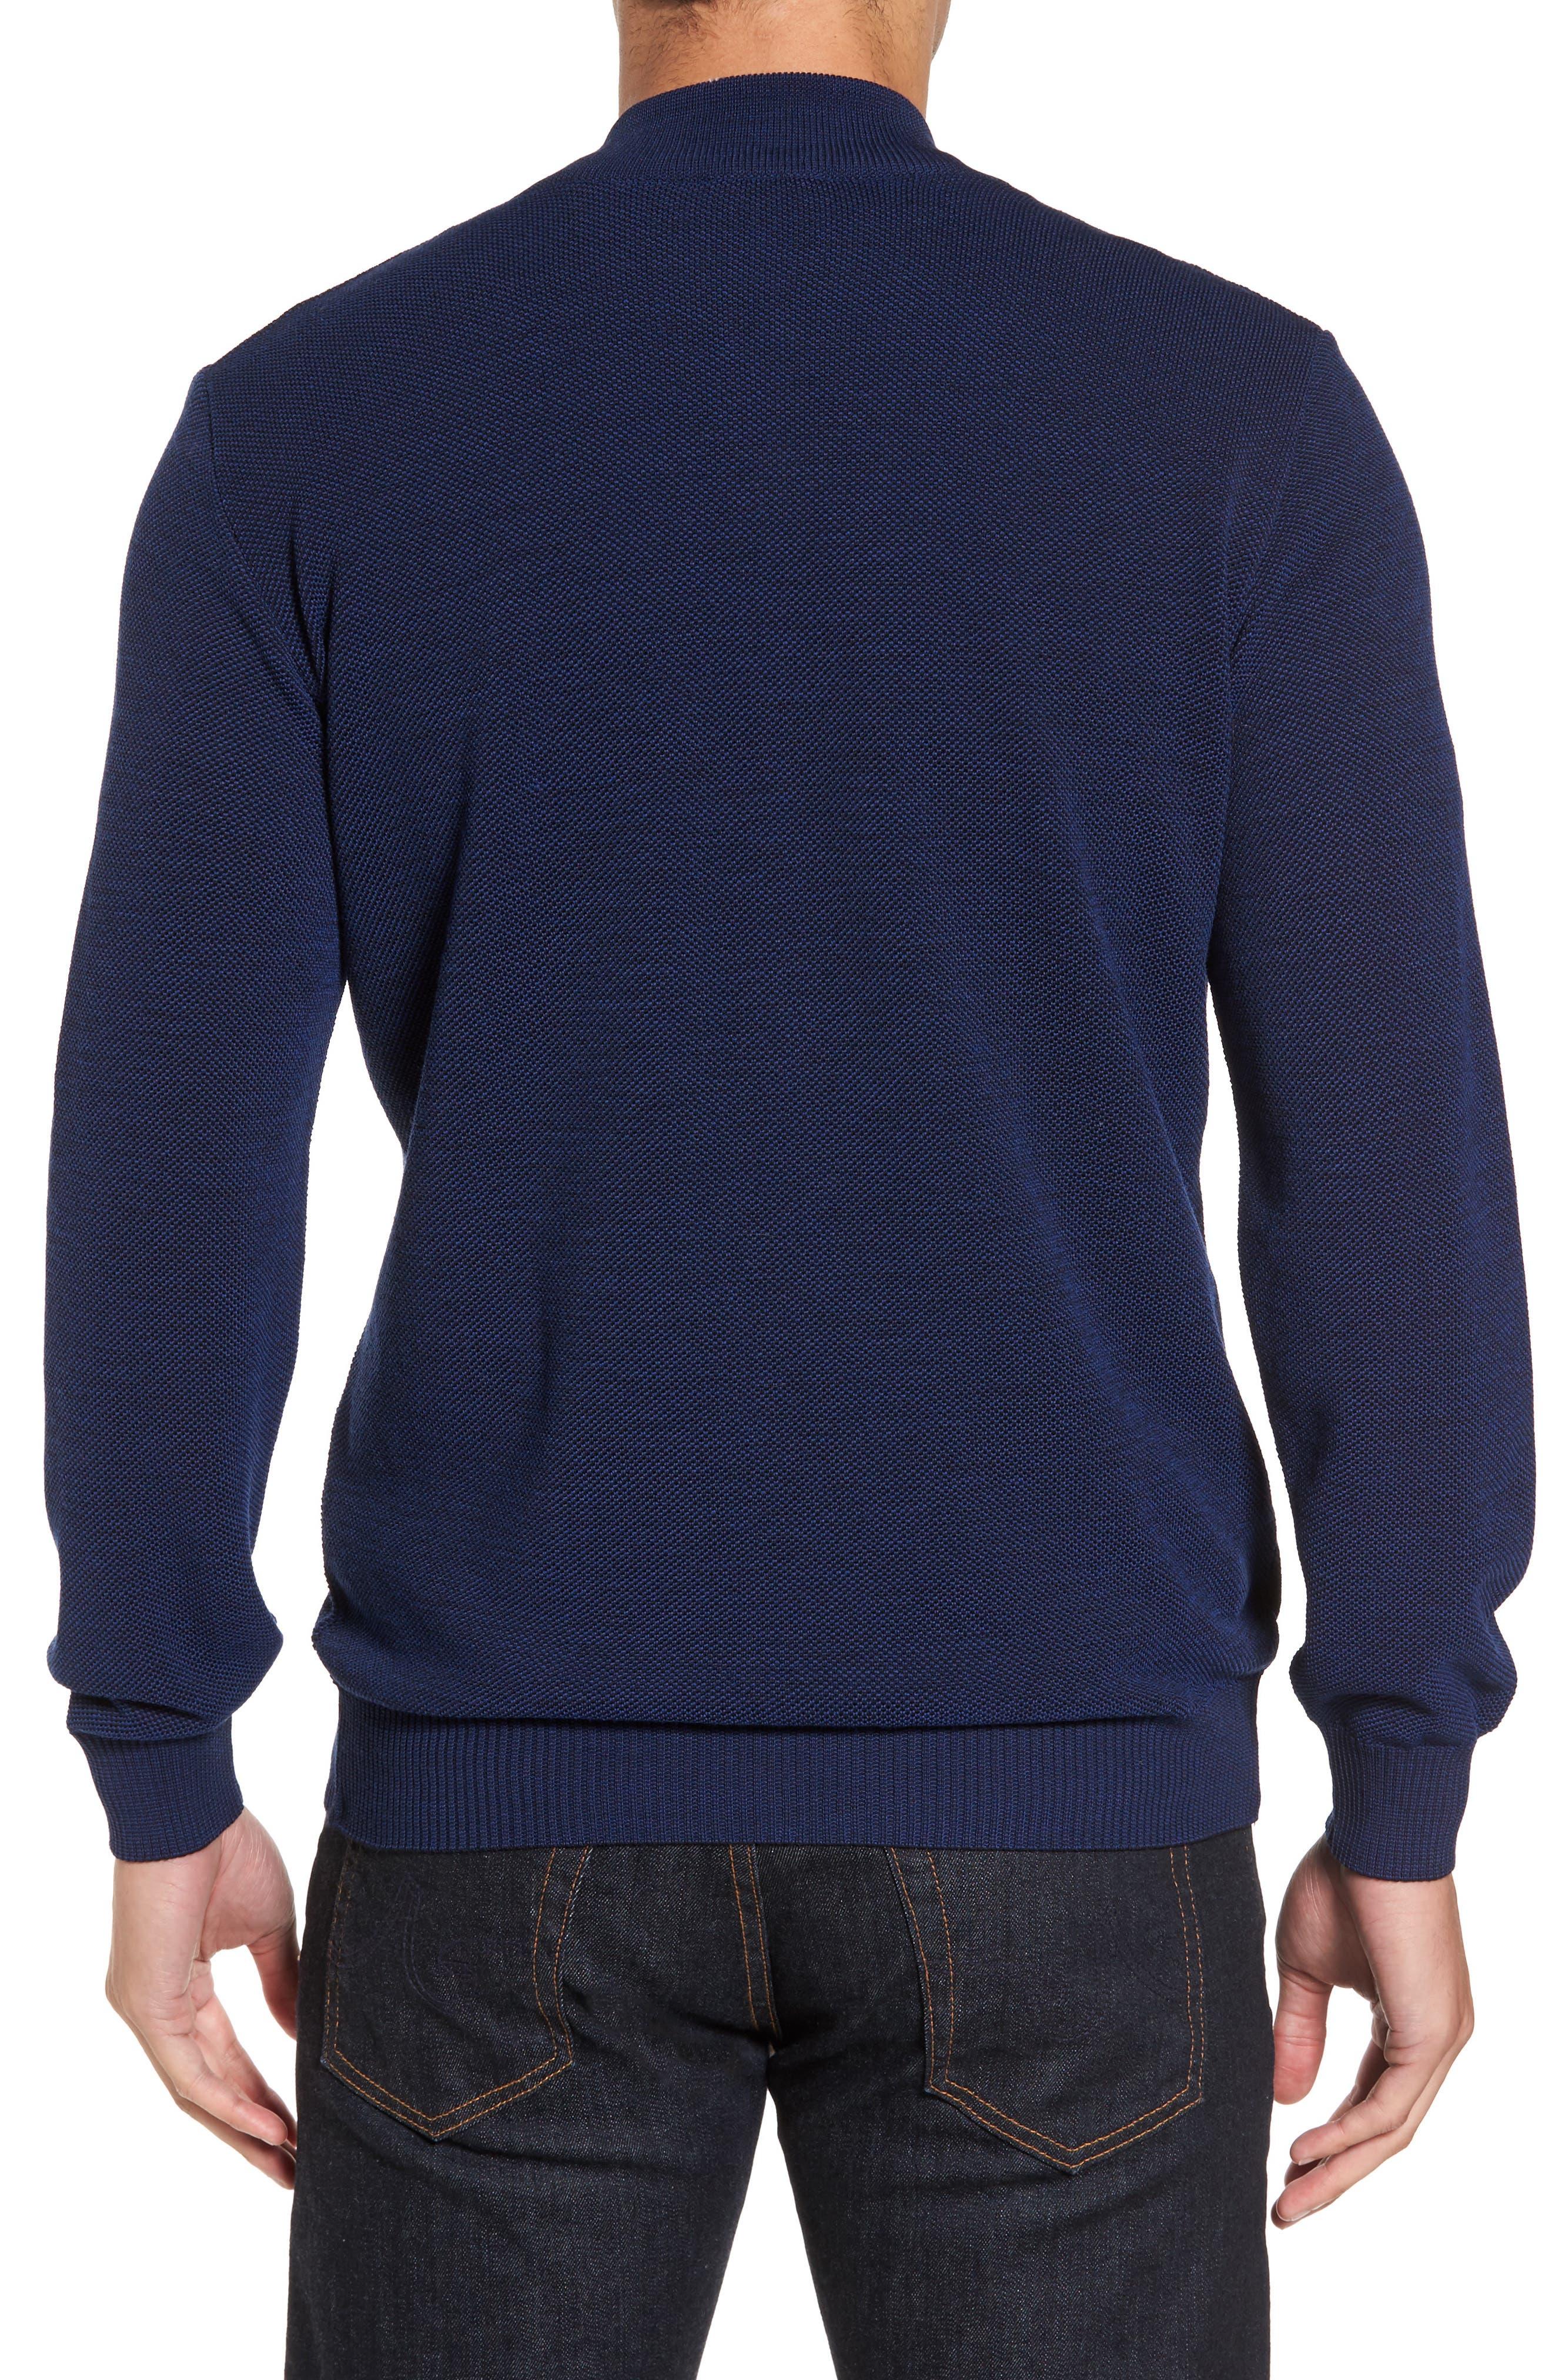 Alternate Image 2  - Paul & Shark Piqué Zip Wool Sweater